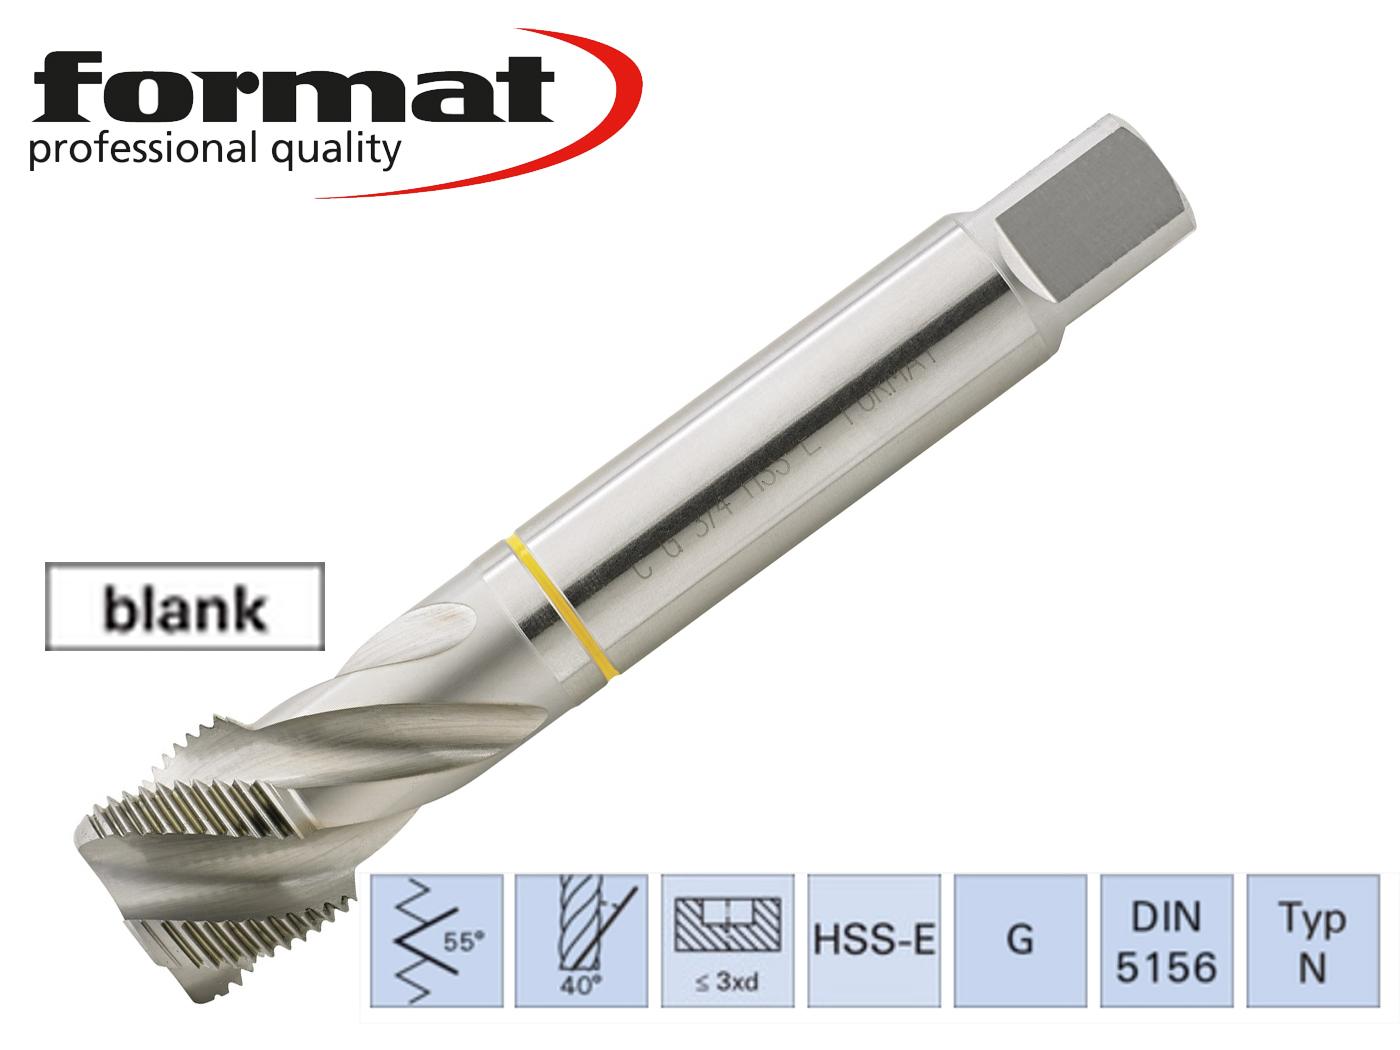 Machinetappen G DIN 5156. C HSSE Co 5 geslepen | DKMTools - DKM Tools